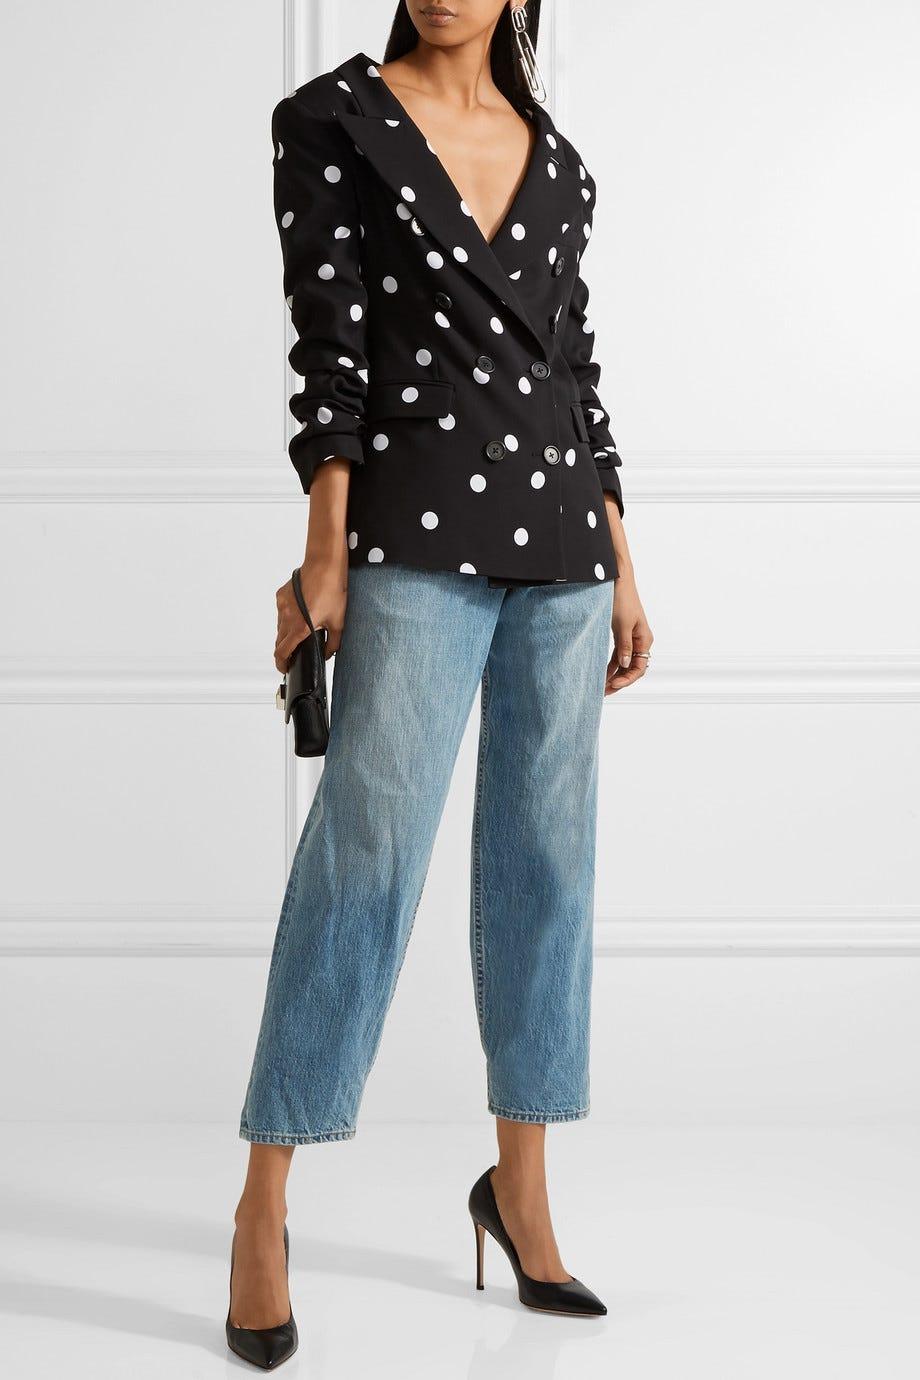 87d85908d7 Cute Ways To Wear The Polka Dot Trend Winter 2018